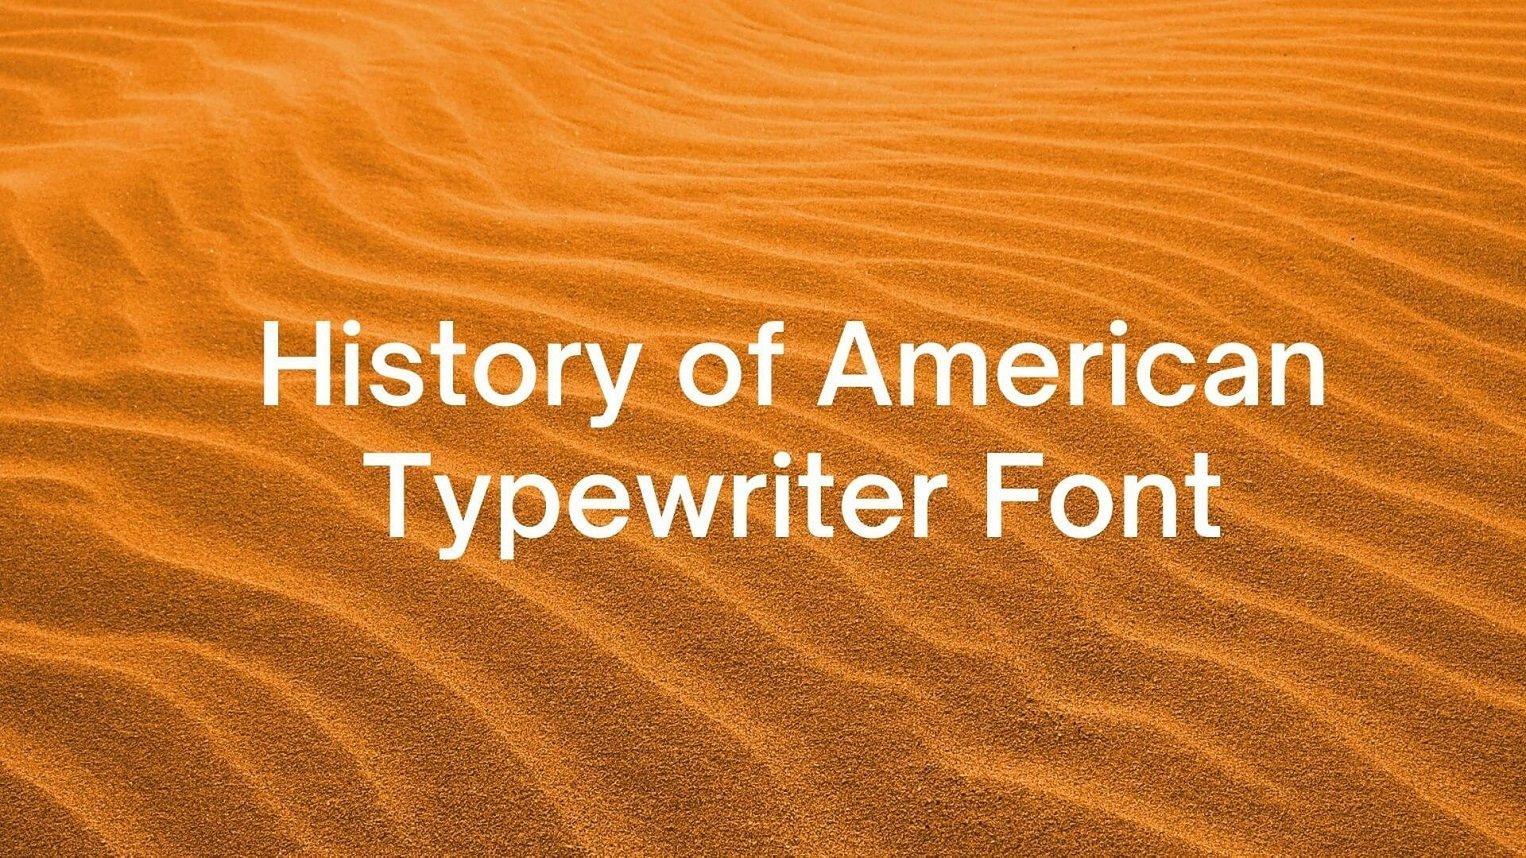 History of American Typewriter Font